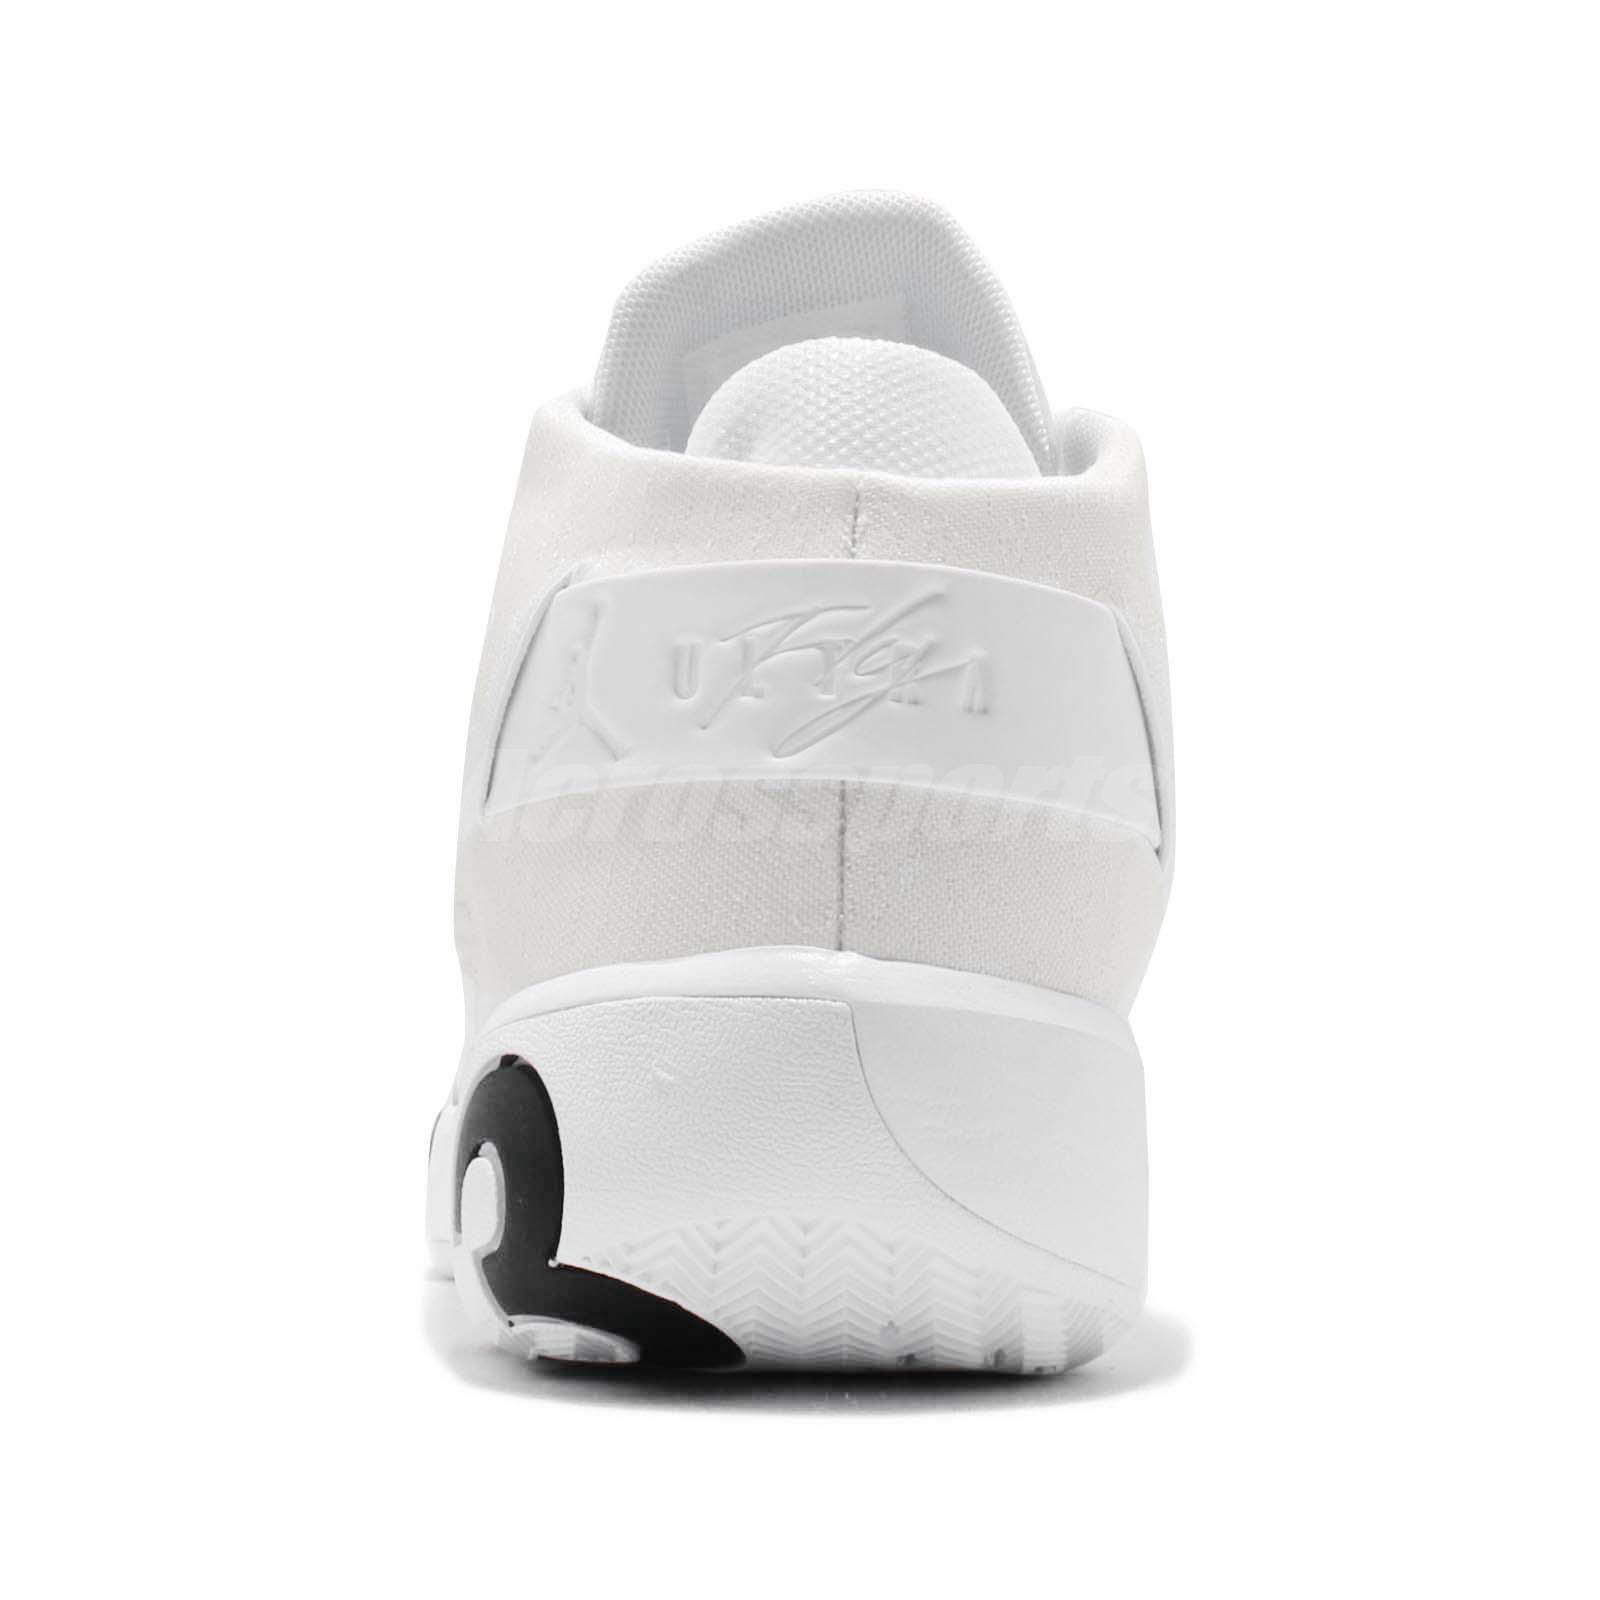 930183dae4a Nike Jordan Ultra Fly 3 PFX 23 White Black Men Basketball Shoes ...